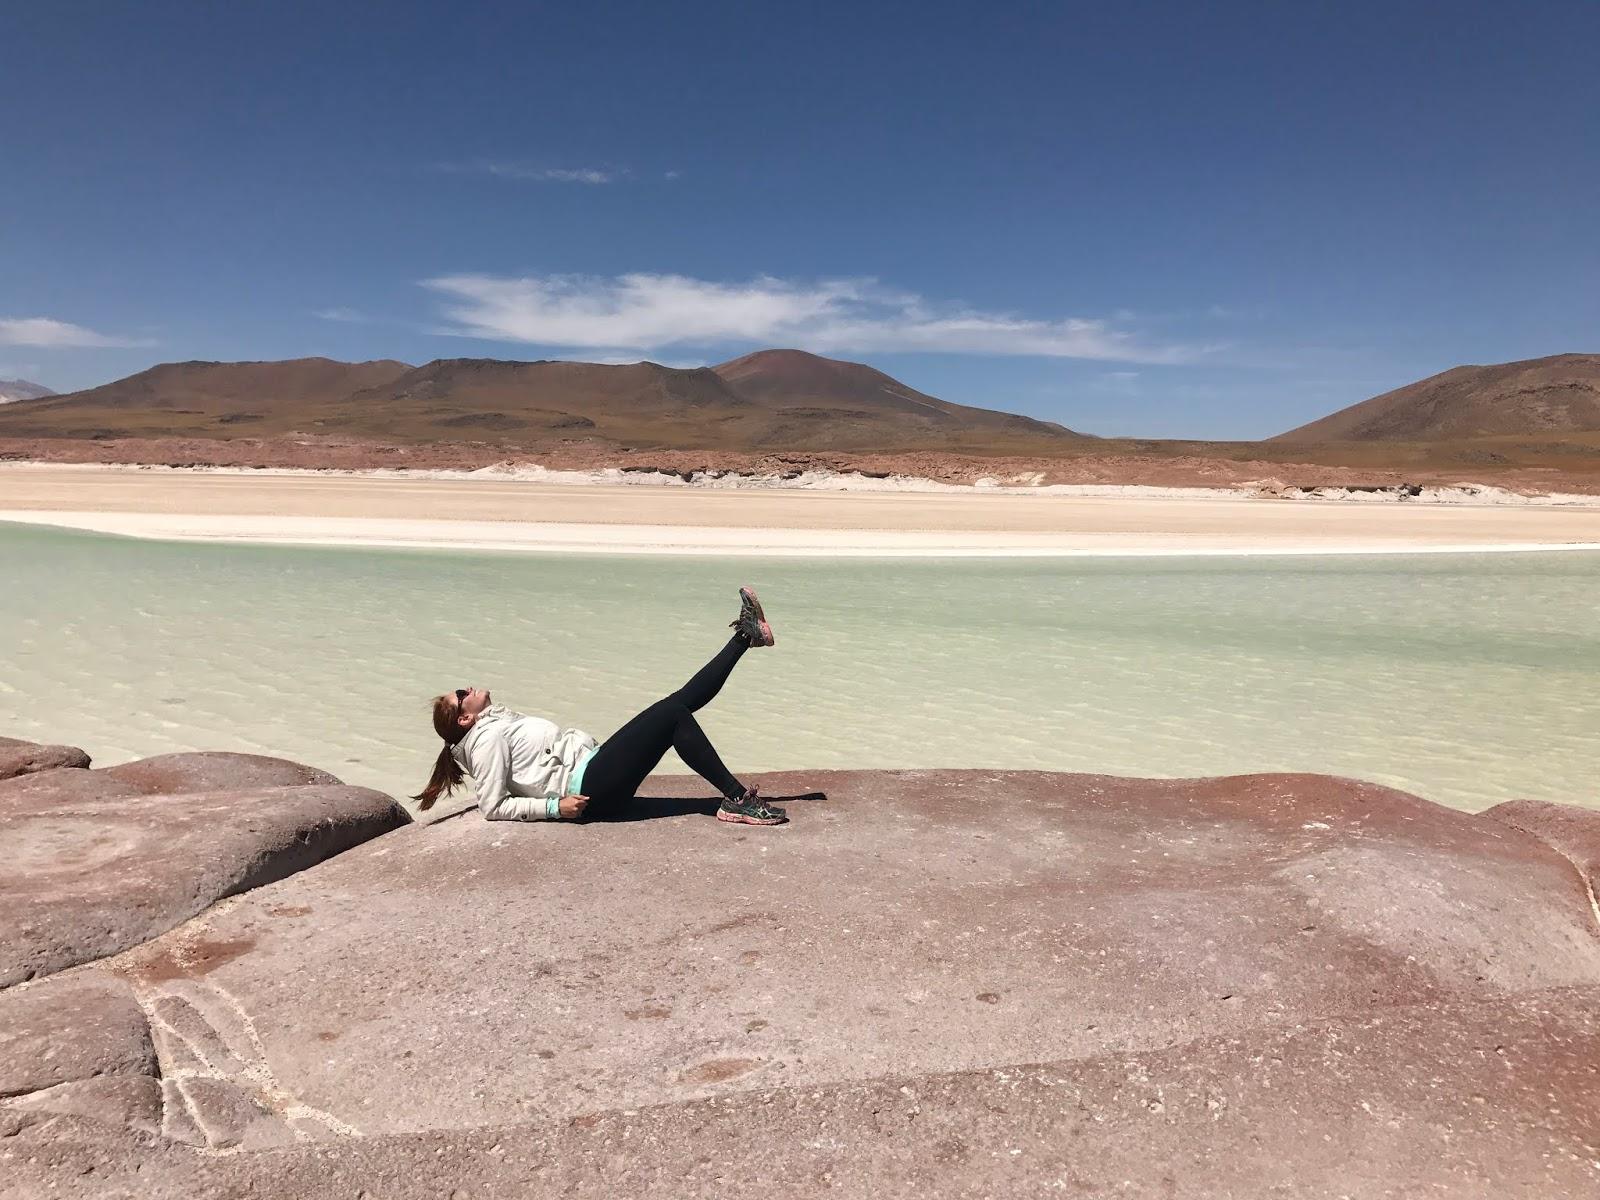 Piedras Rojas - Deserto do Atacama